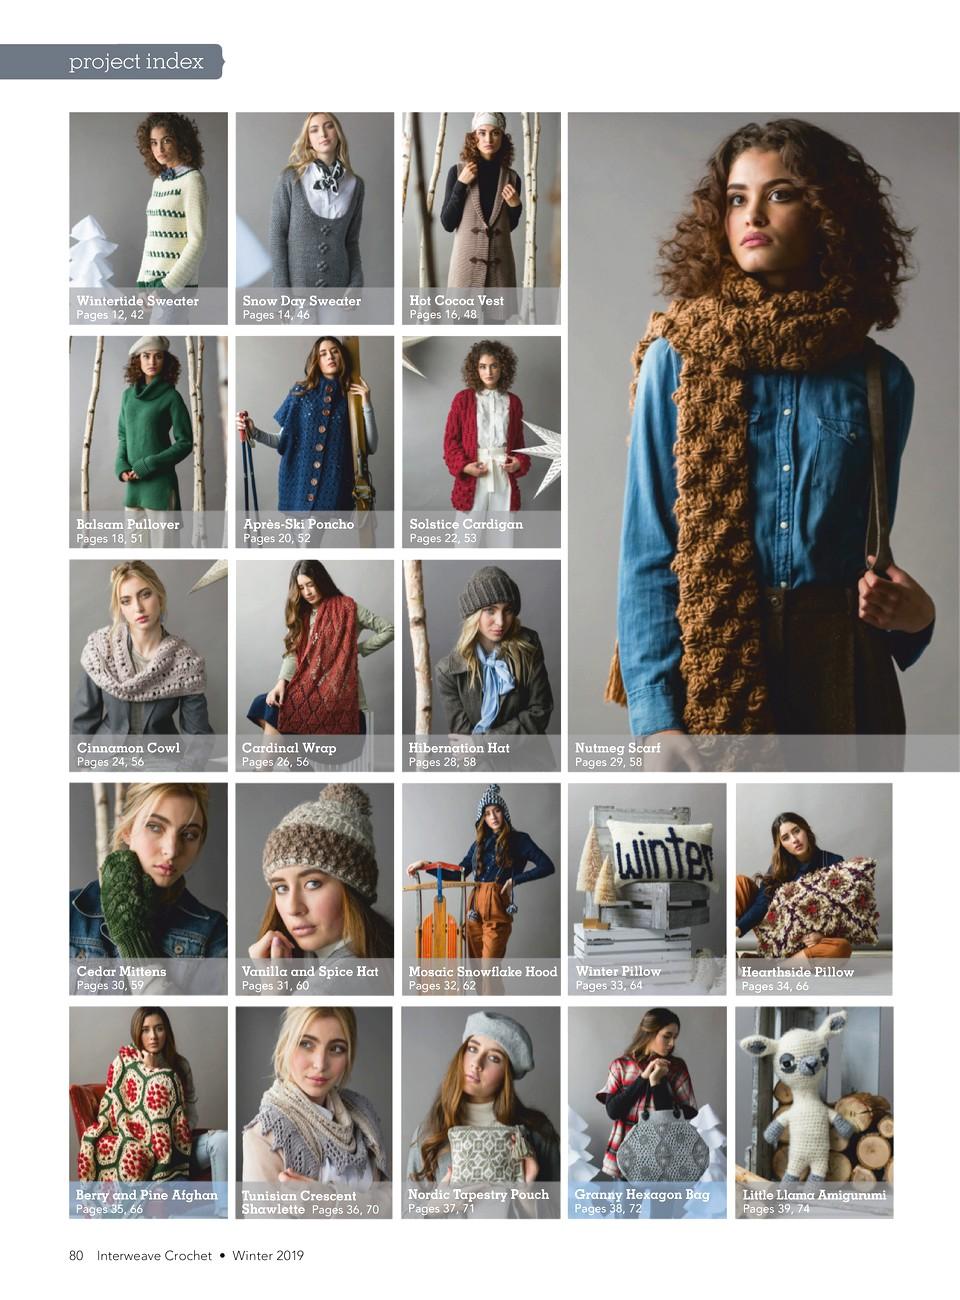 Interweave Crochet Winter 2019-81